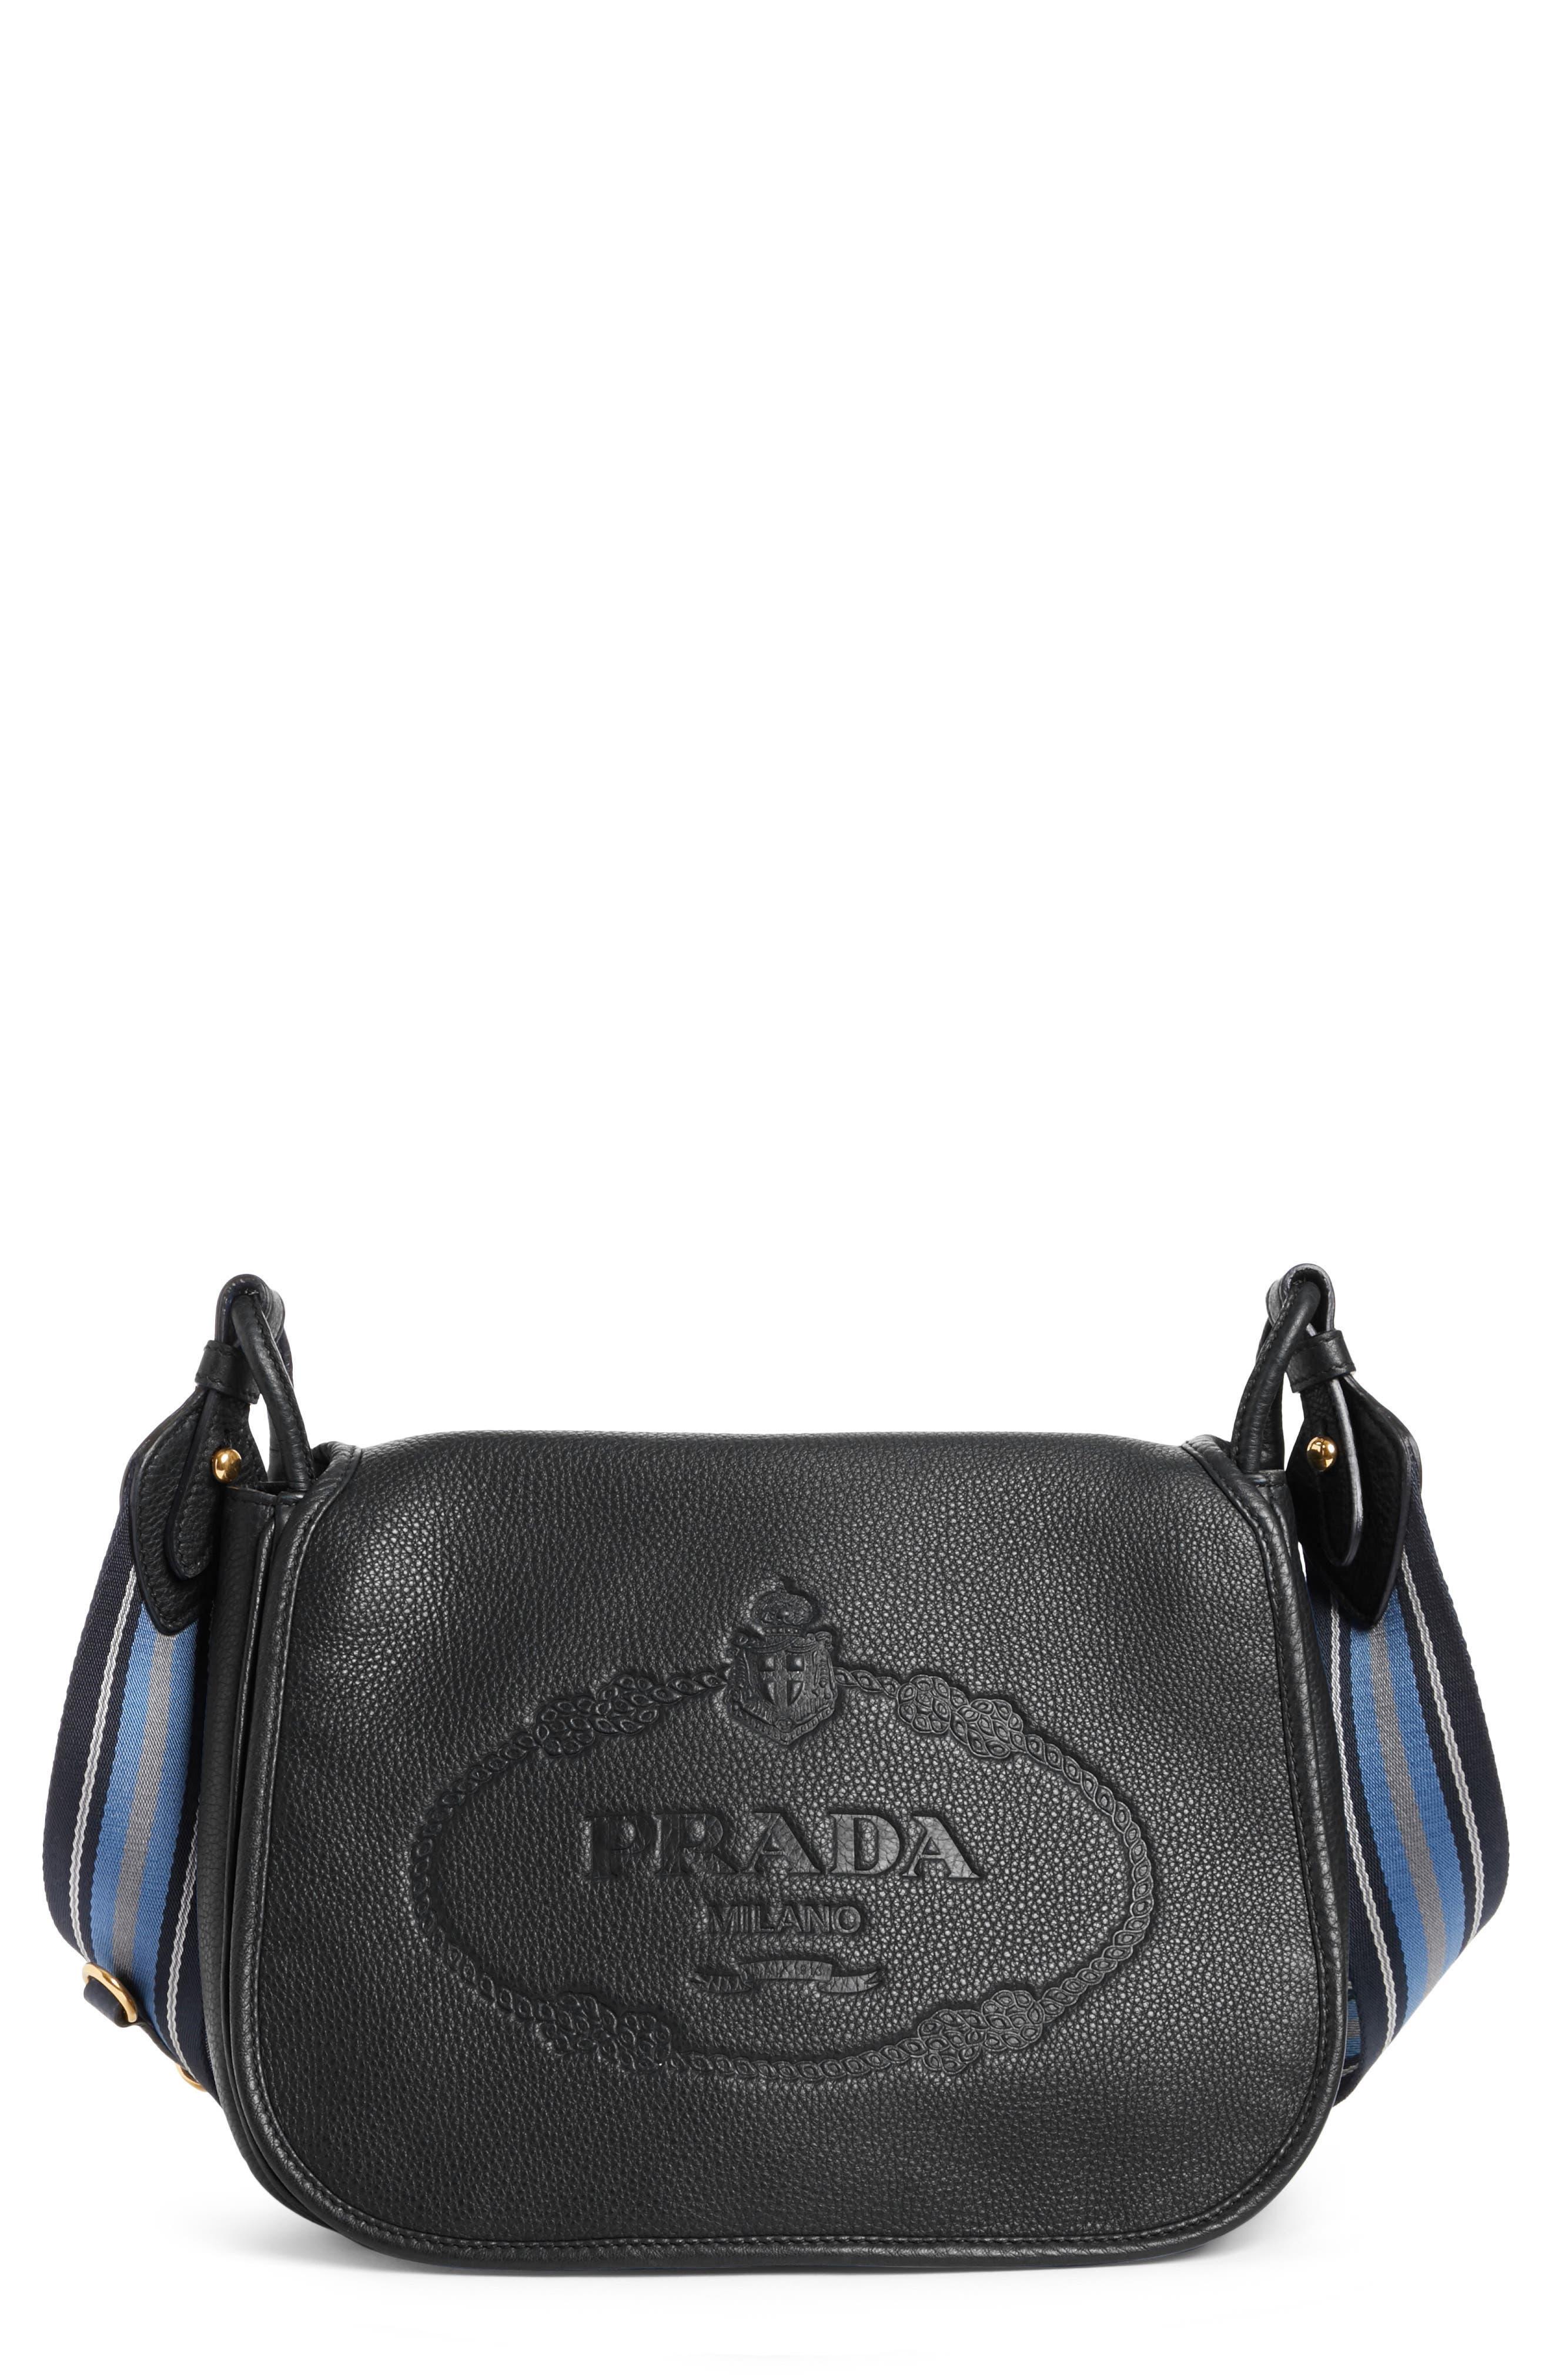 Prada Vitello Daino Heritage Logo Leather Crossbody Bag